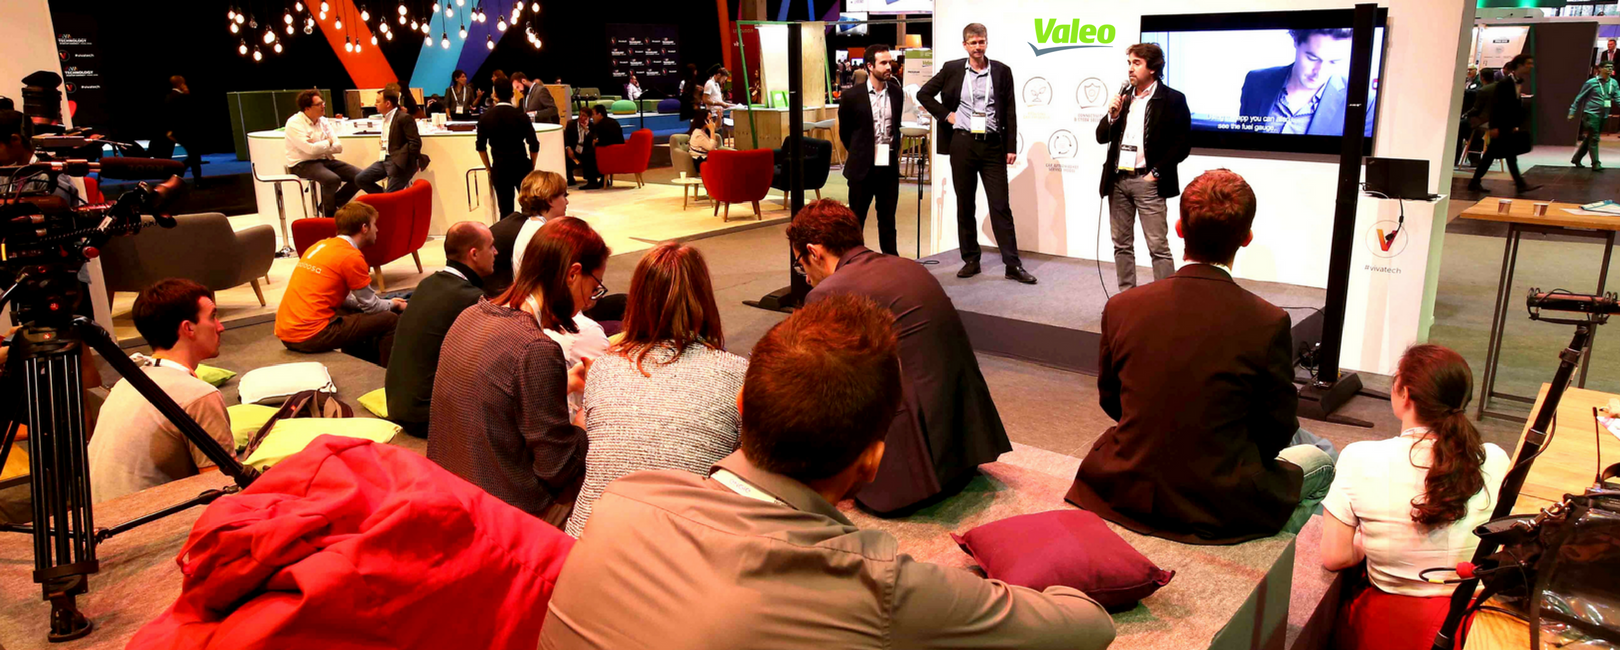 Valeo at Viva technology